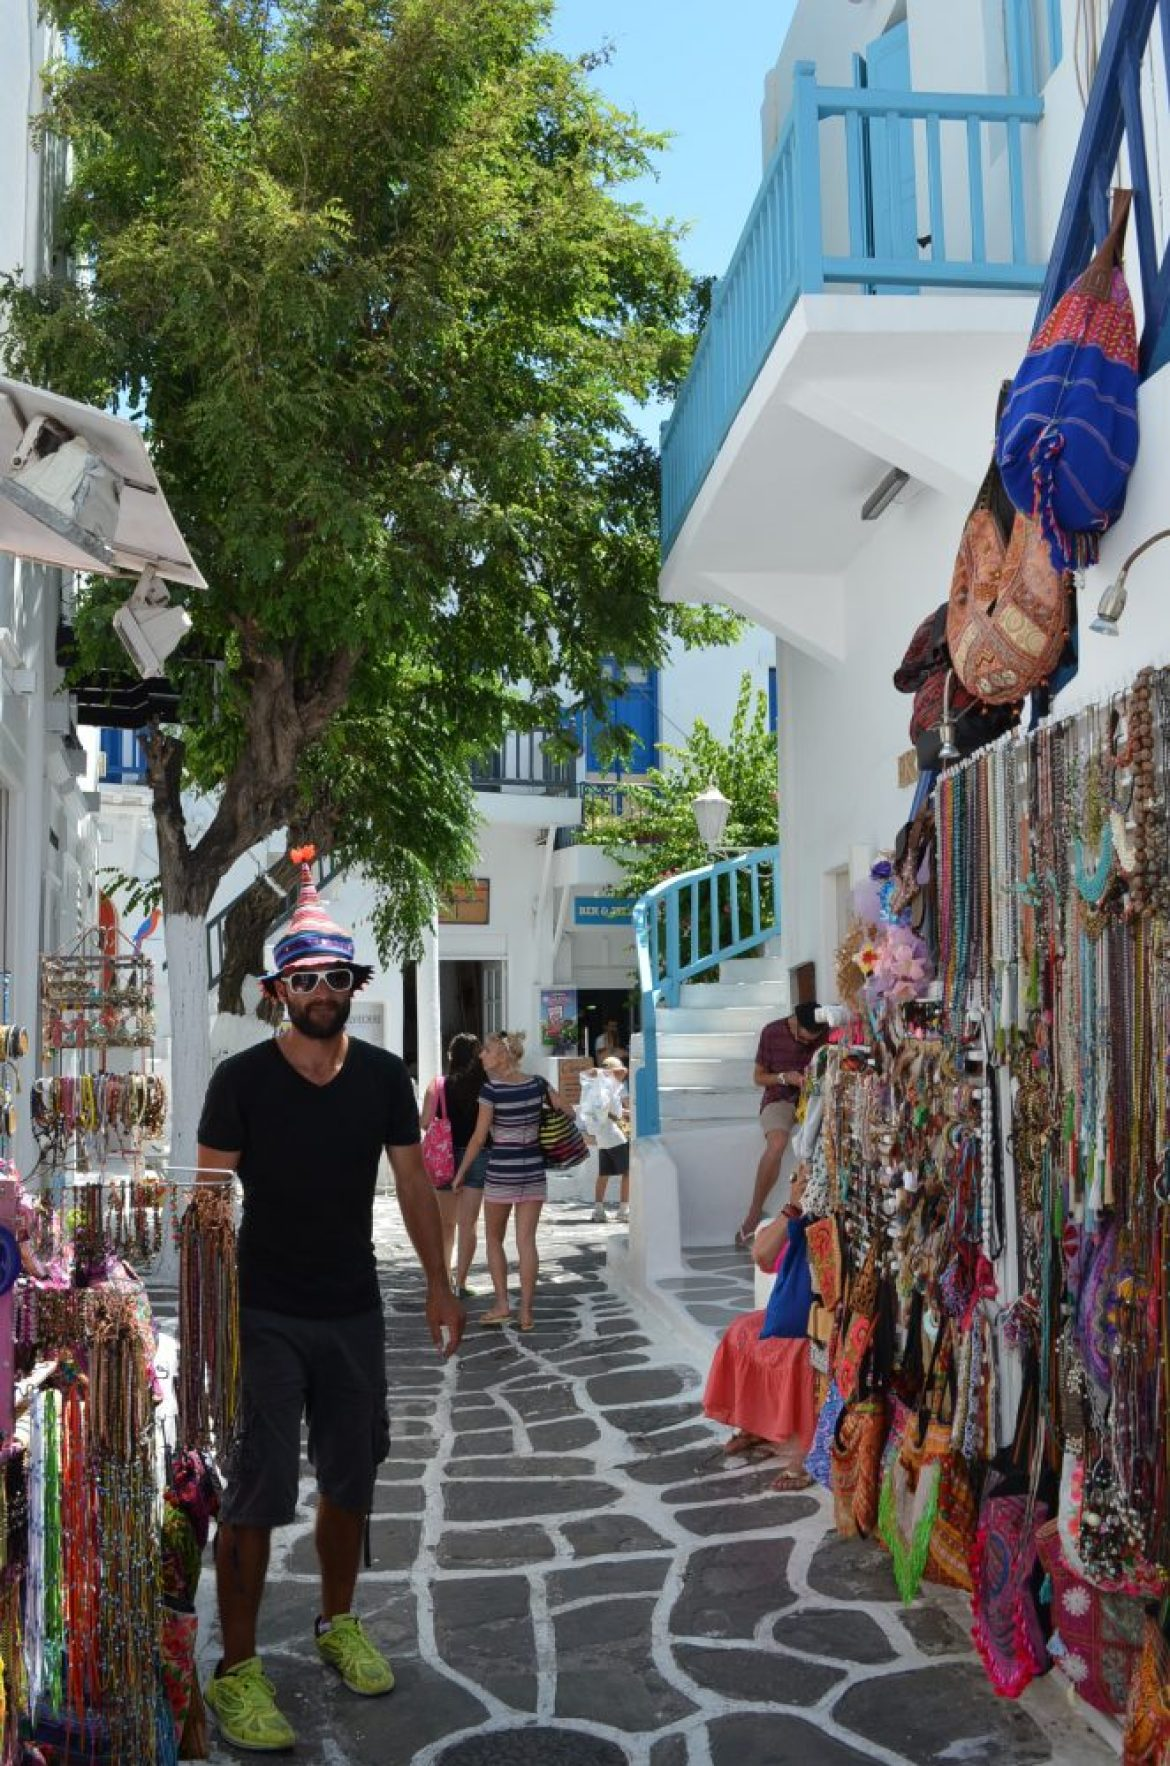 Matogianni-shopping-street-Mykonos-2